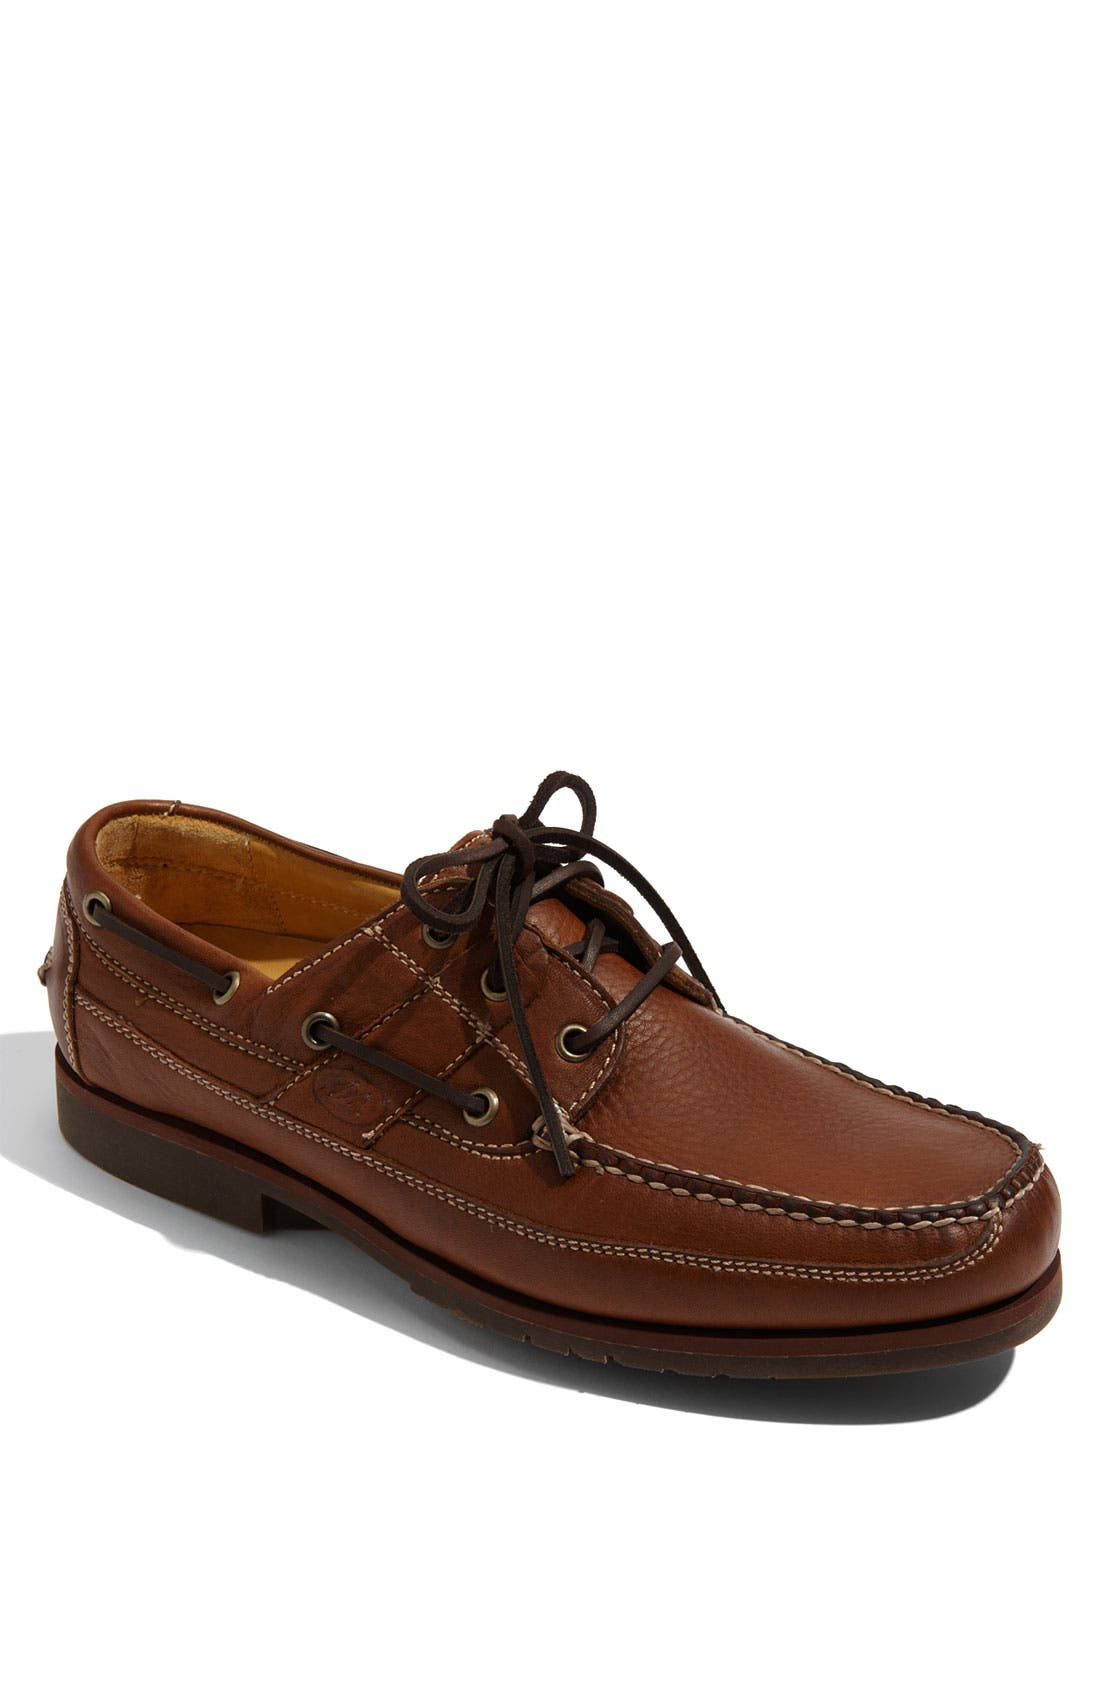 NEIL M 'Bridgeport' Boat Shoe